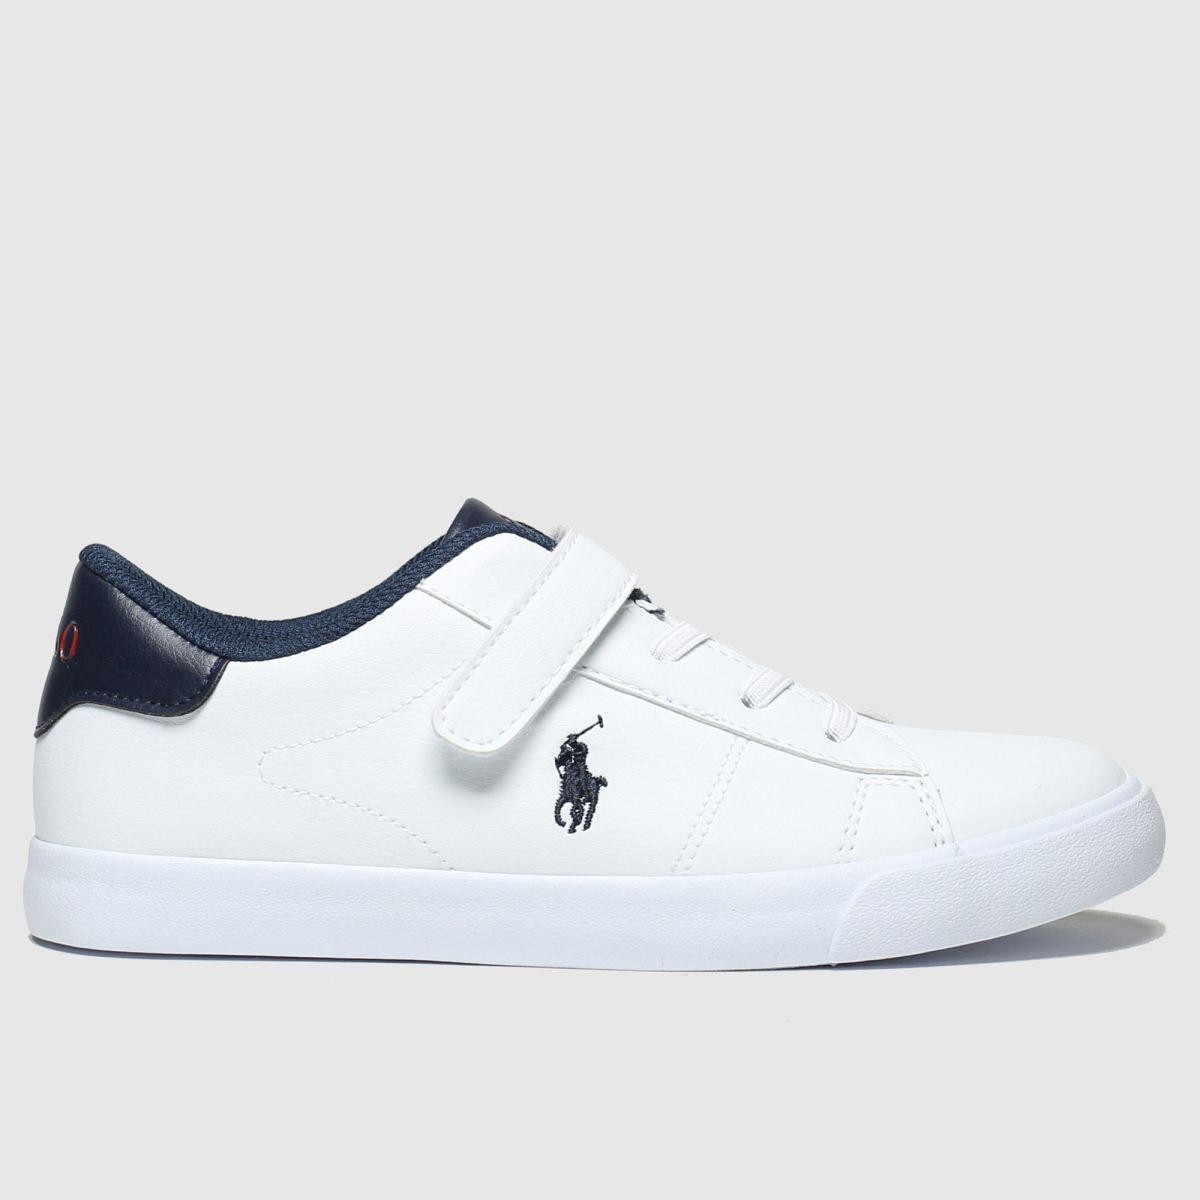 Polo Ralph Lauren White & Navy Pierce Ii Boots Junior